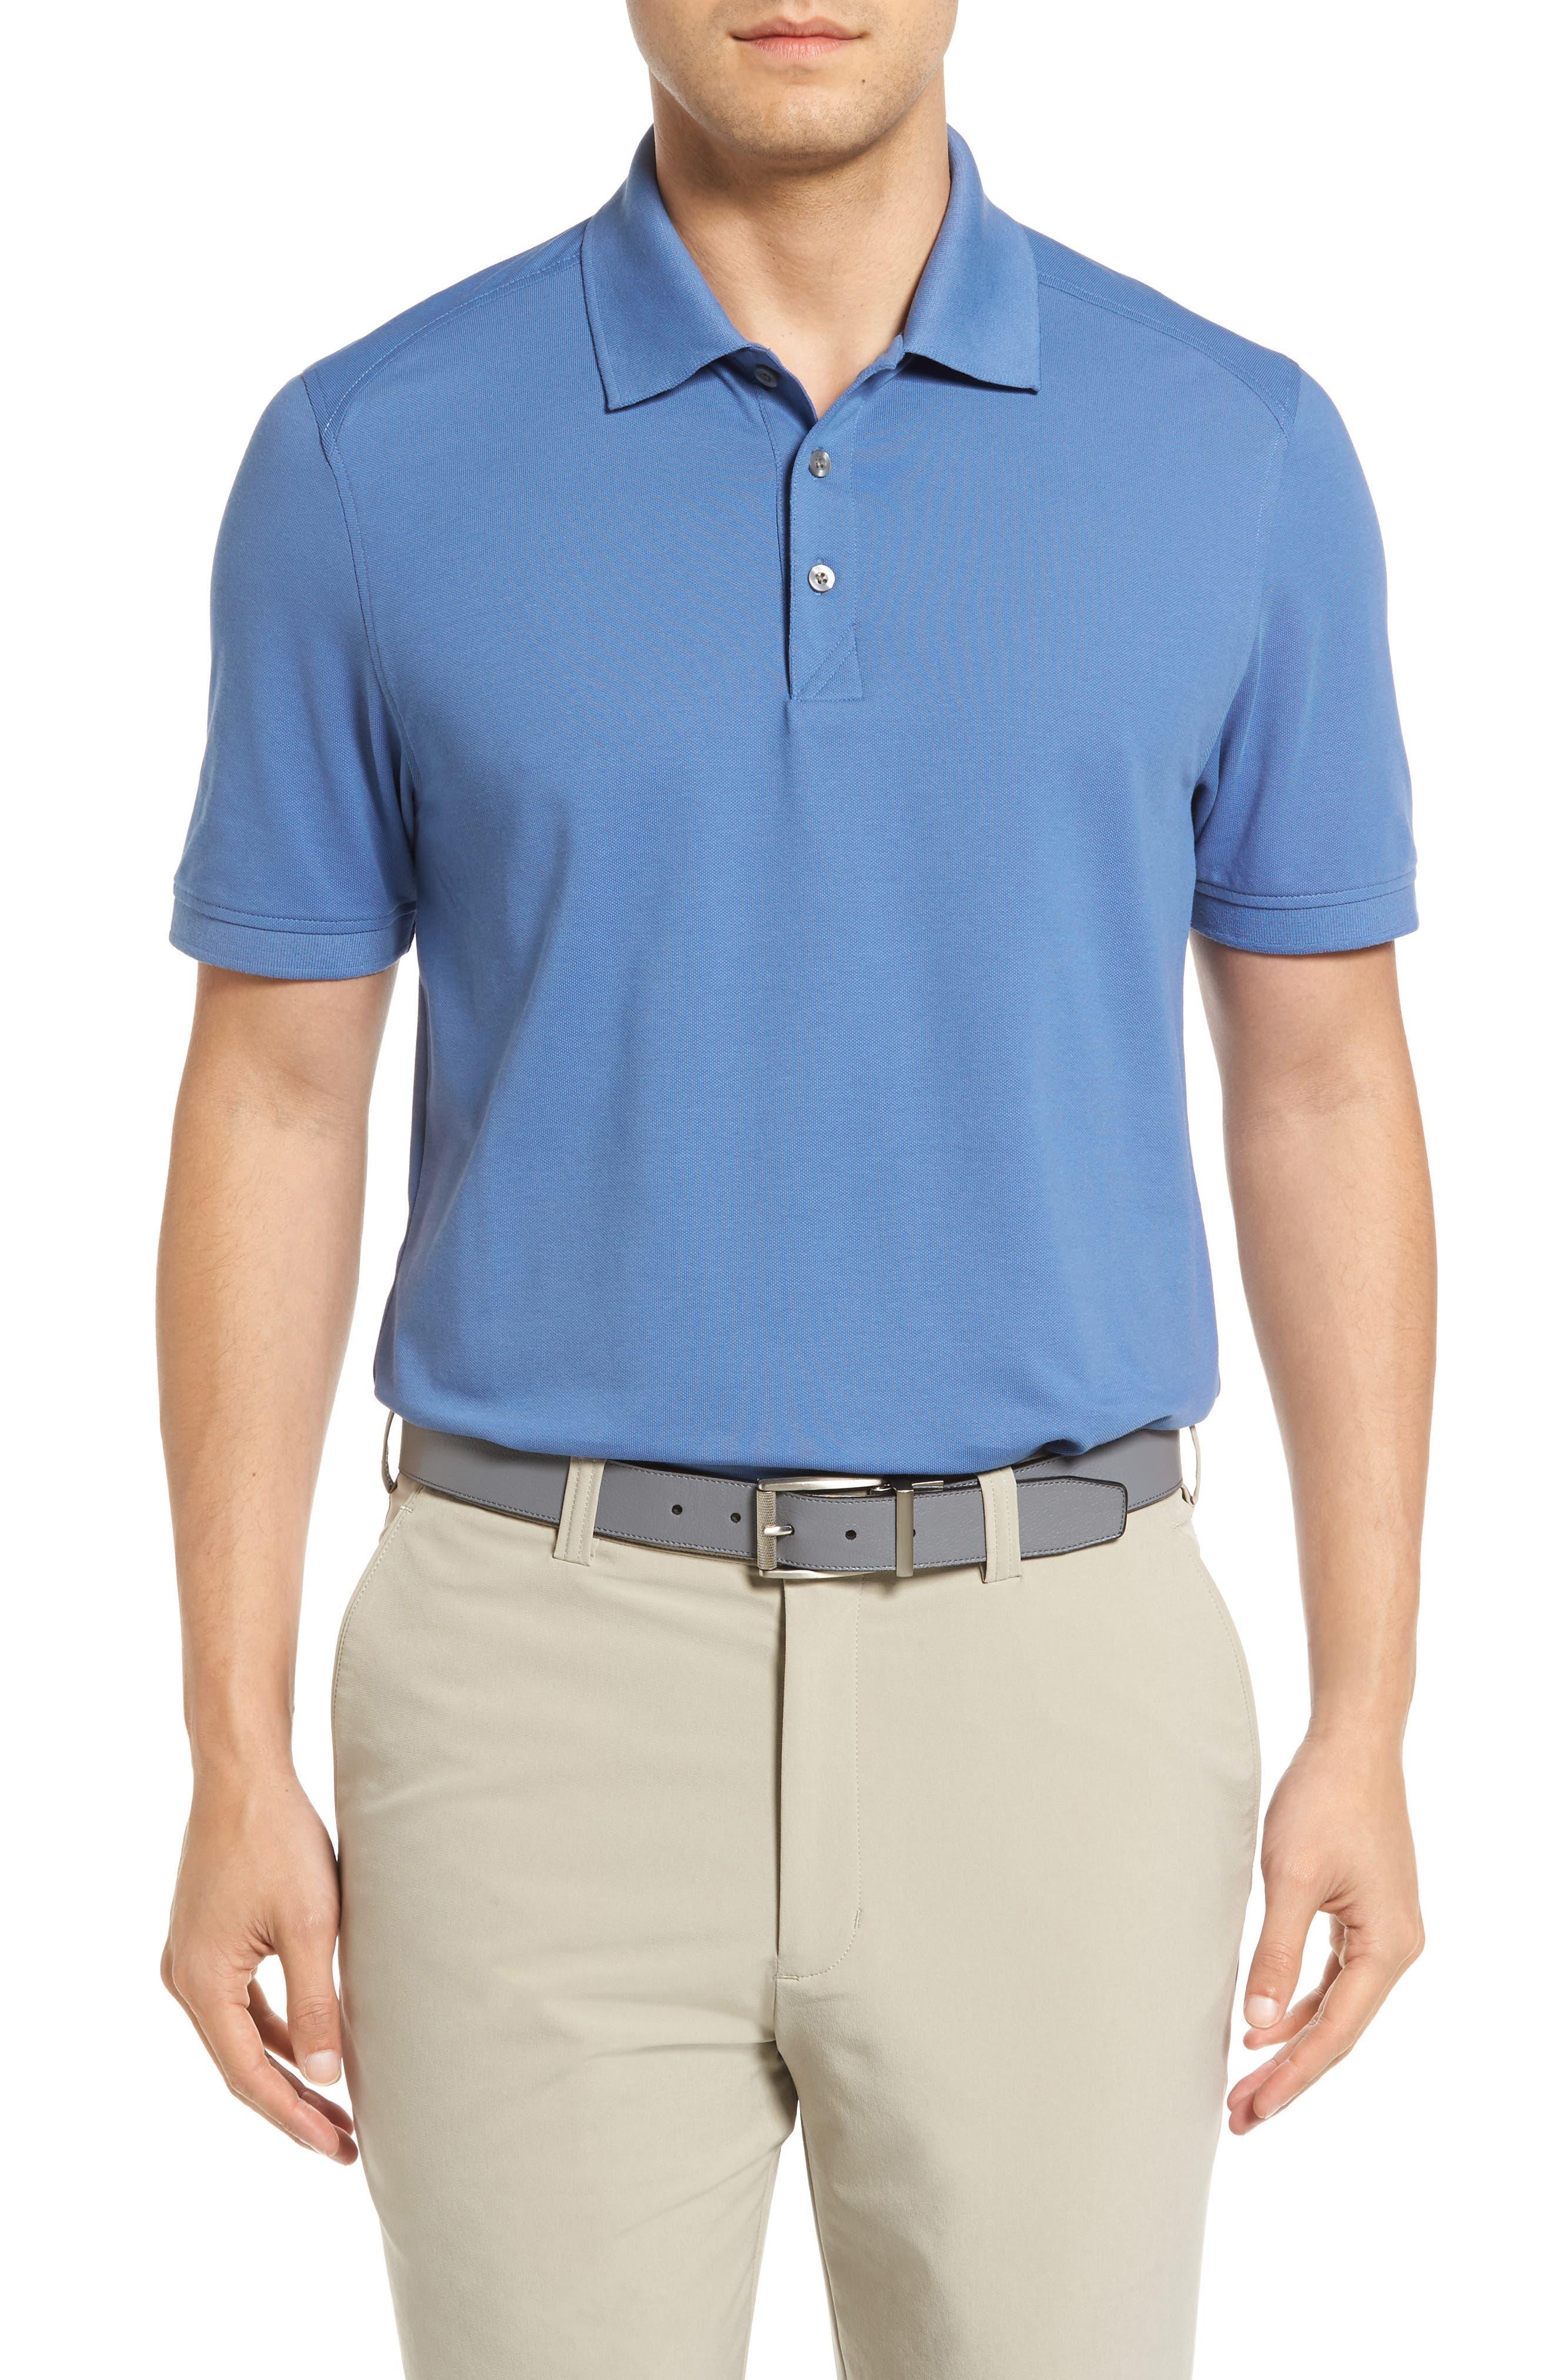 Alternate Image 1 Selected - Cutter & Buck Advantage Golf Polo